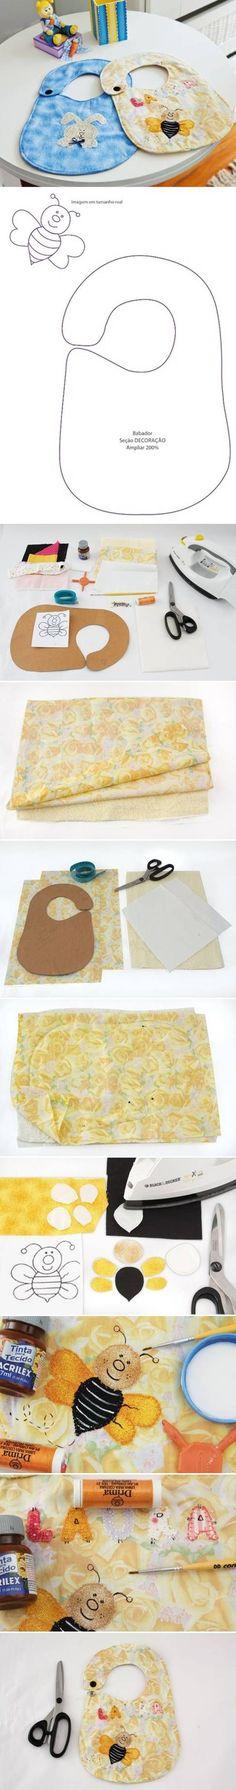 DIY Baby Bibs DIY Projects | UsefulDIY.com Follow Us on Facebook ==> http://www.facebook.com/UsefulDiy